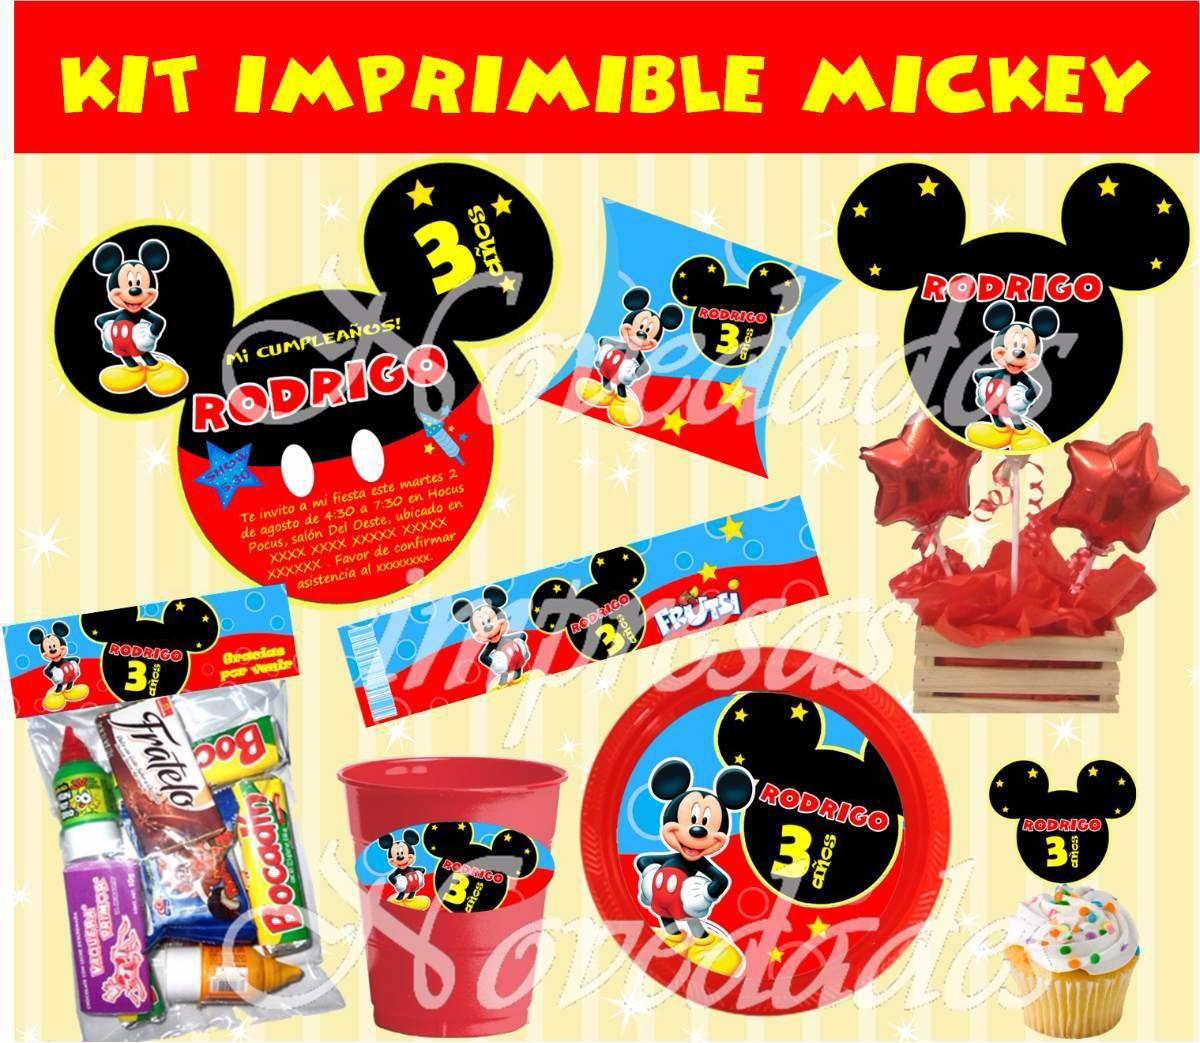 Kit Imprimible Mickey Mouse Tarjetas Cumpleanos Invitacion 6 - S/ 9 ...